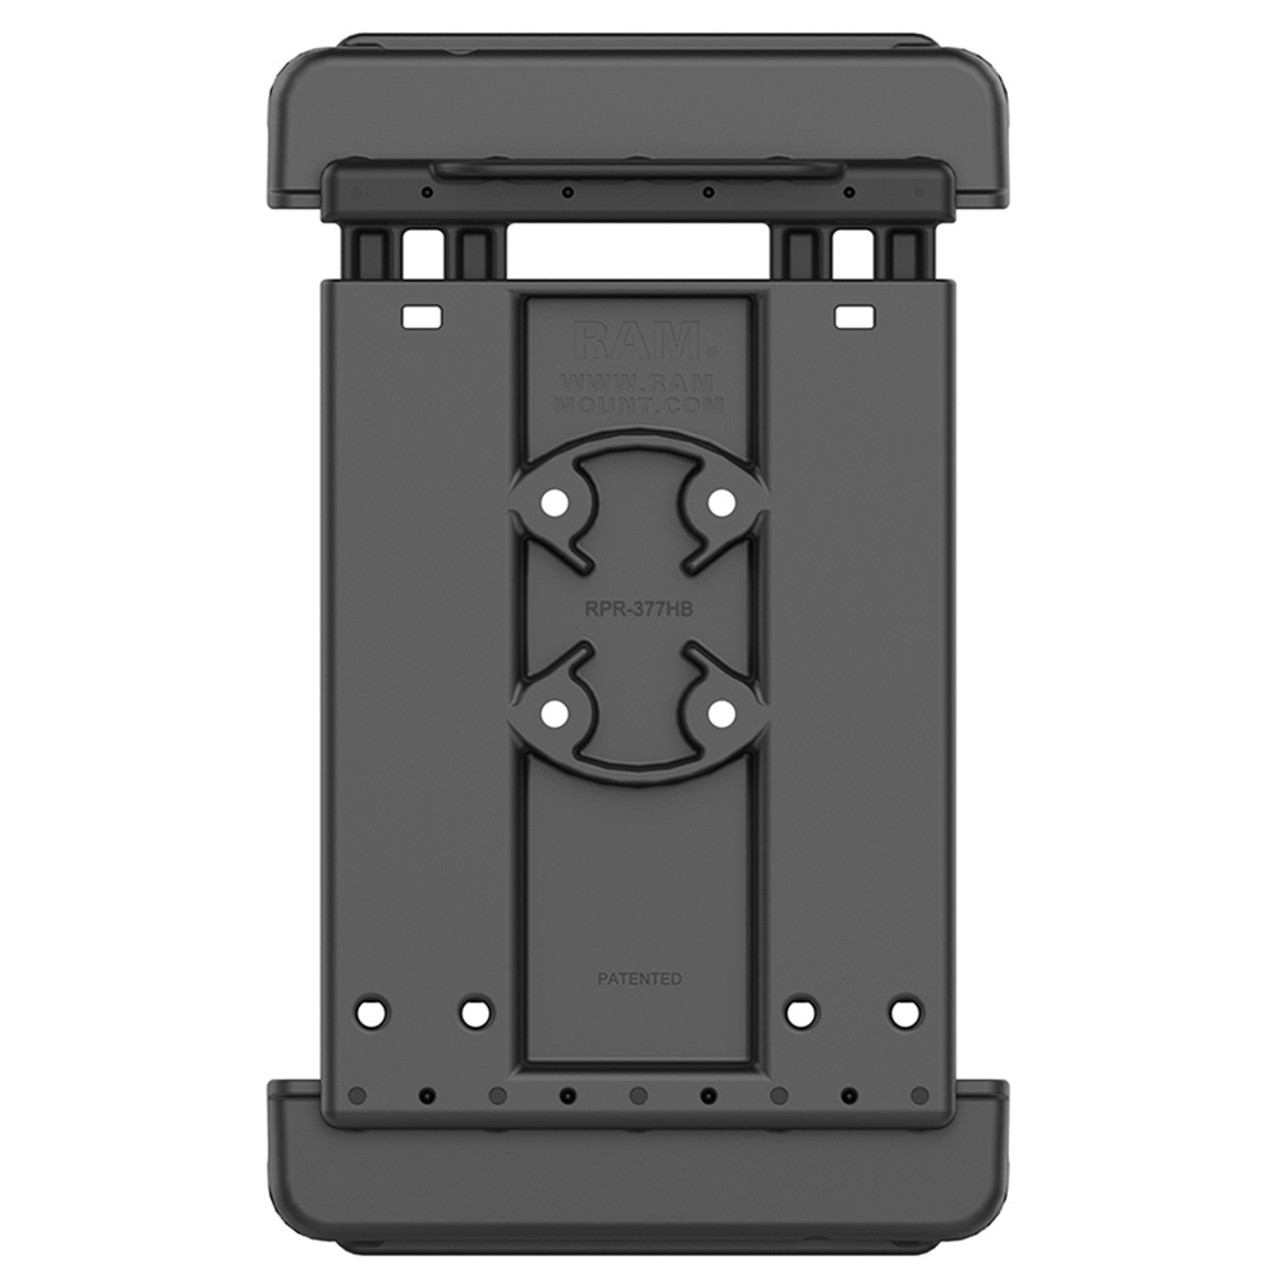 "RAM Mount Tab-Tite Cradle f\/8"" Tablets - Samsung Galaxy Tab 4 8.0  Tab E 8.0 [RAM-HOL-TAB24U]"